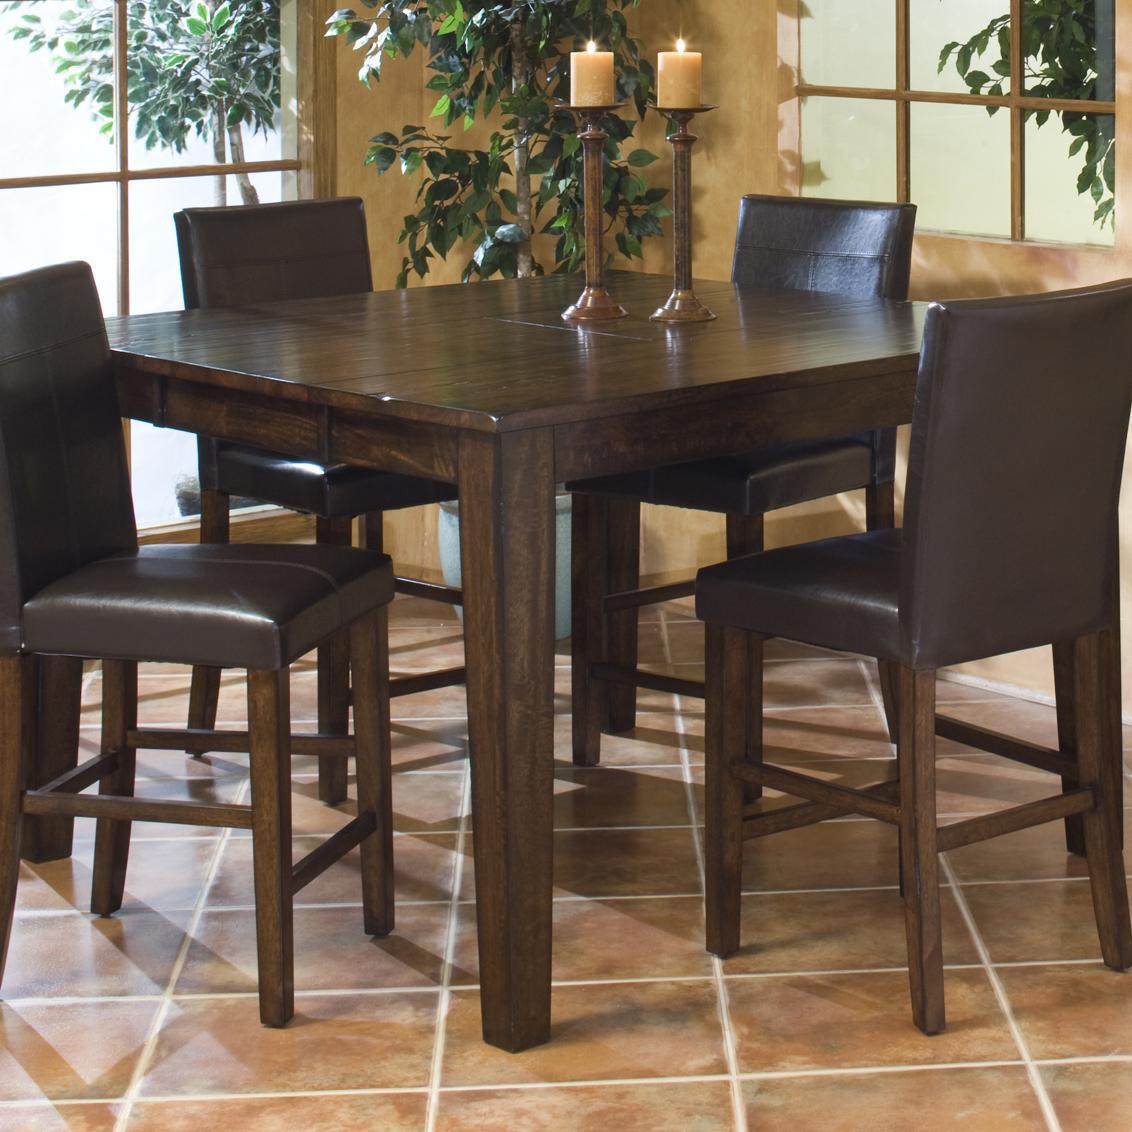 intercon kona solid mango gathering table with butterfly leaf dinette depot pub tables. Black Bedroom Furniture Sets. Home Design Ideas